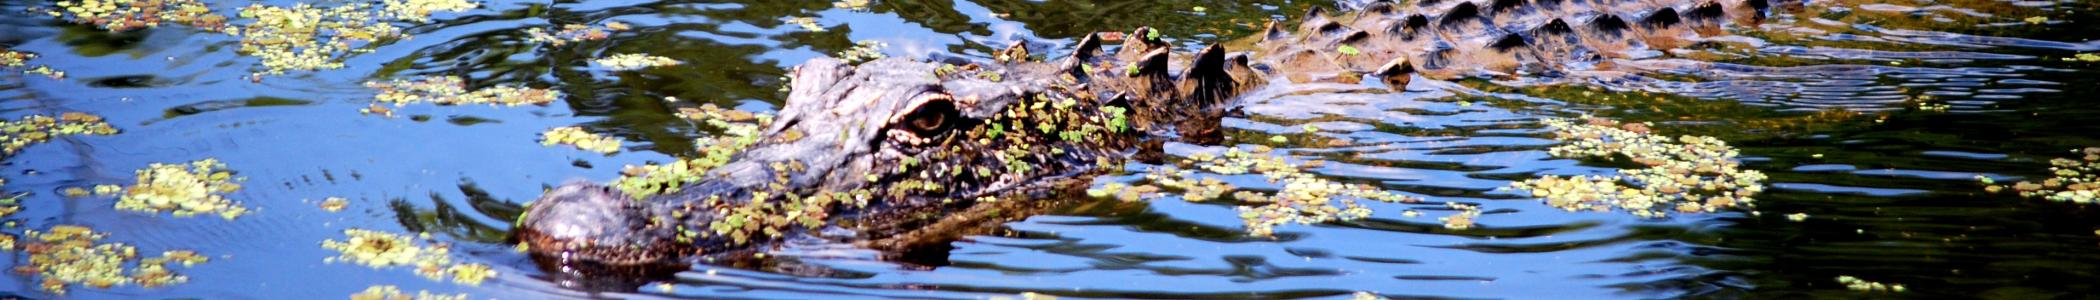 alligator in swamp banner